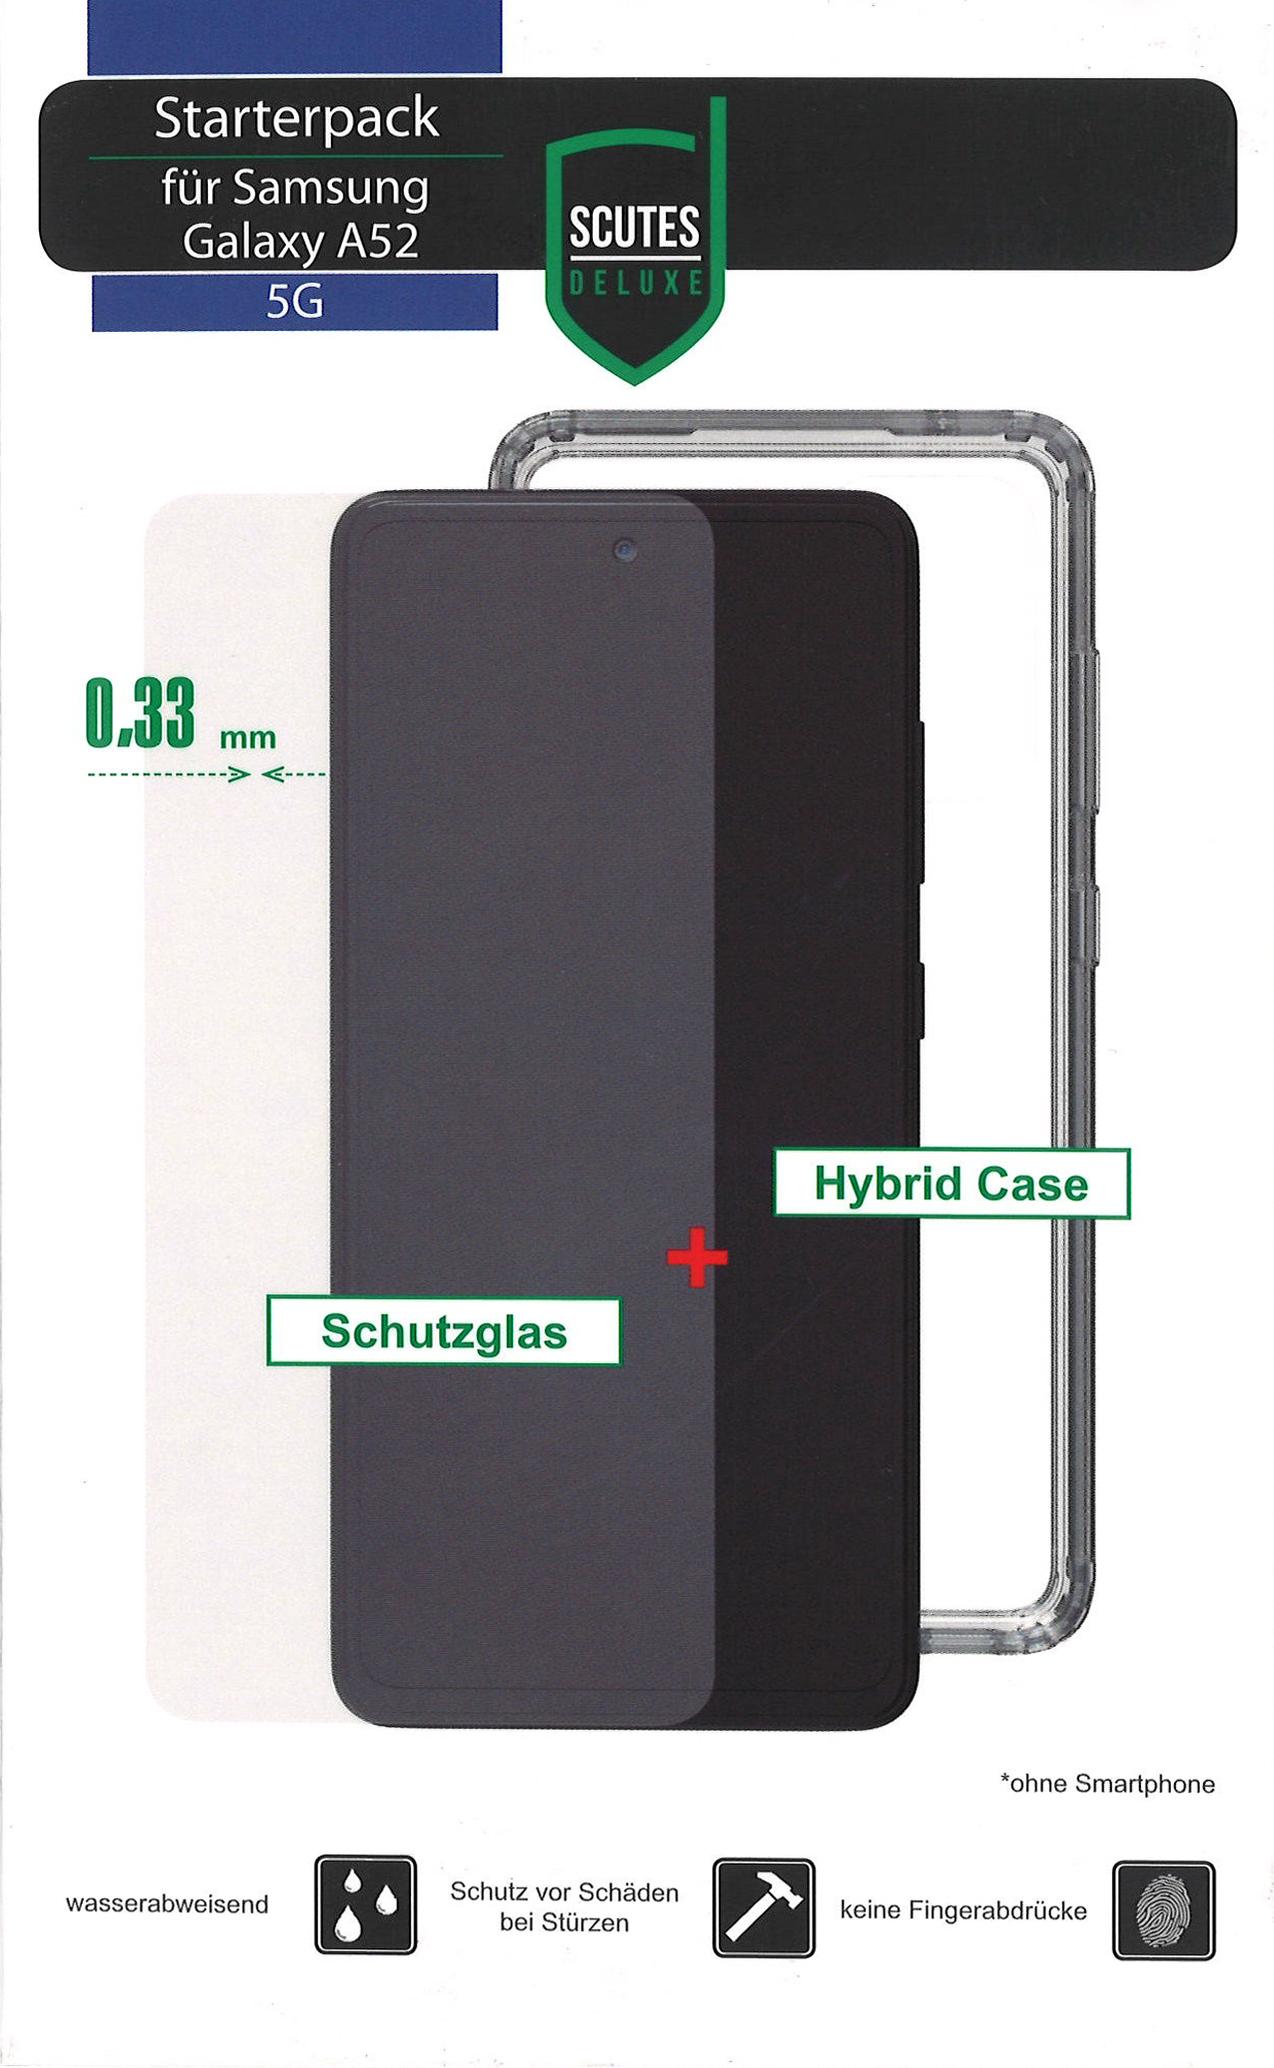 Starterpack (Samsung Galaxy A52)